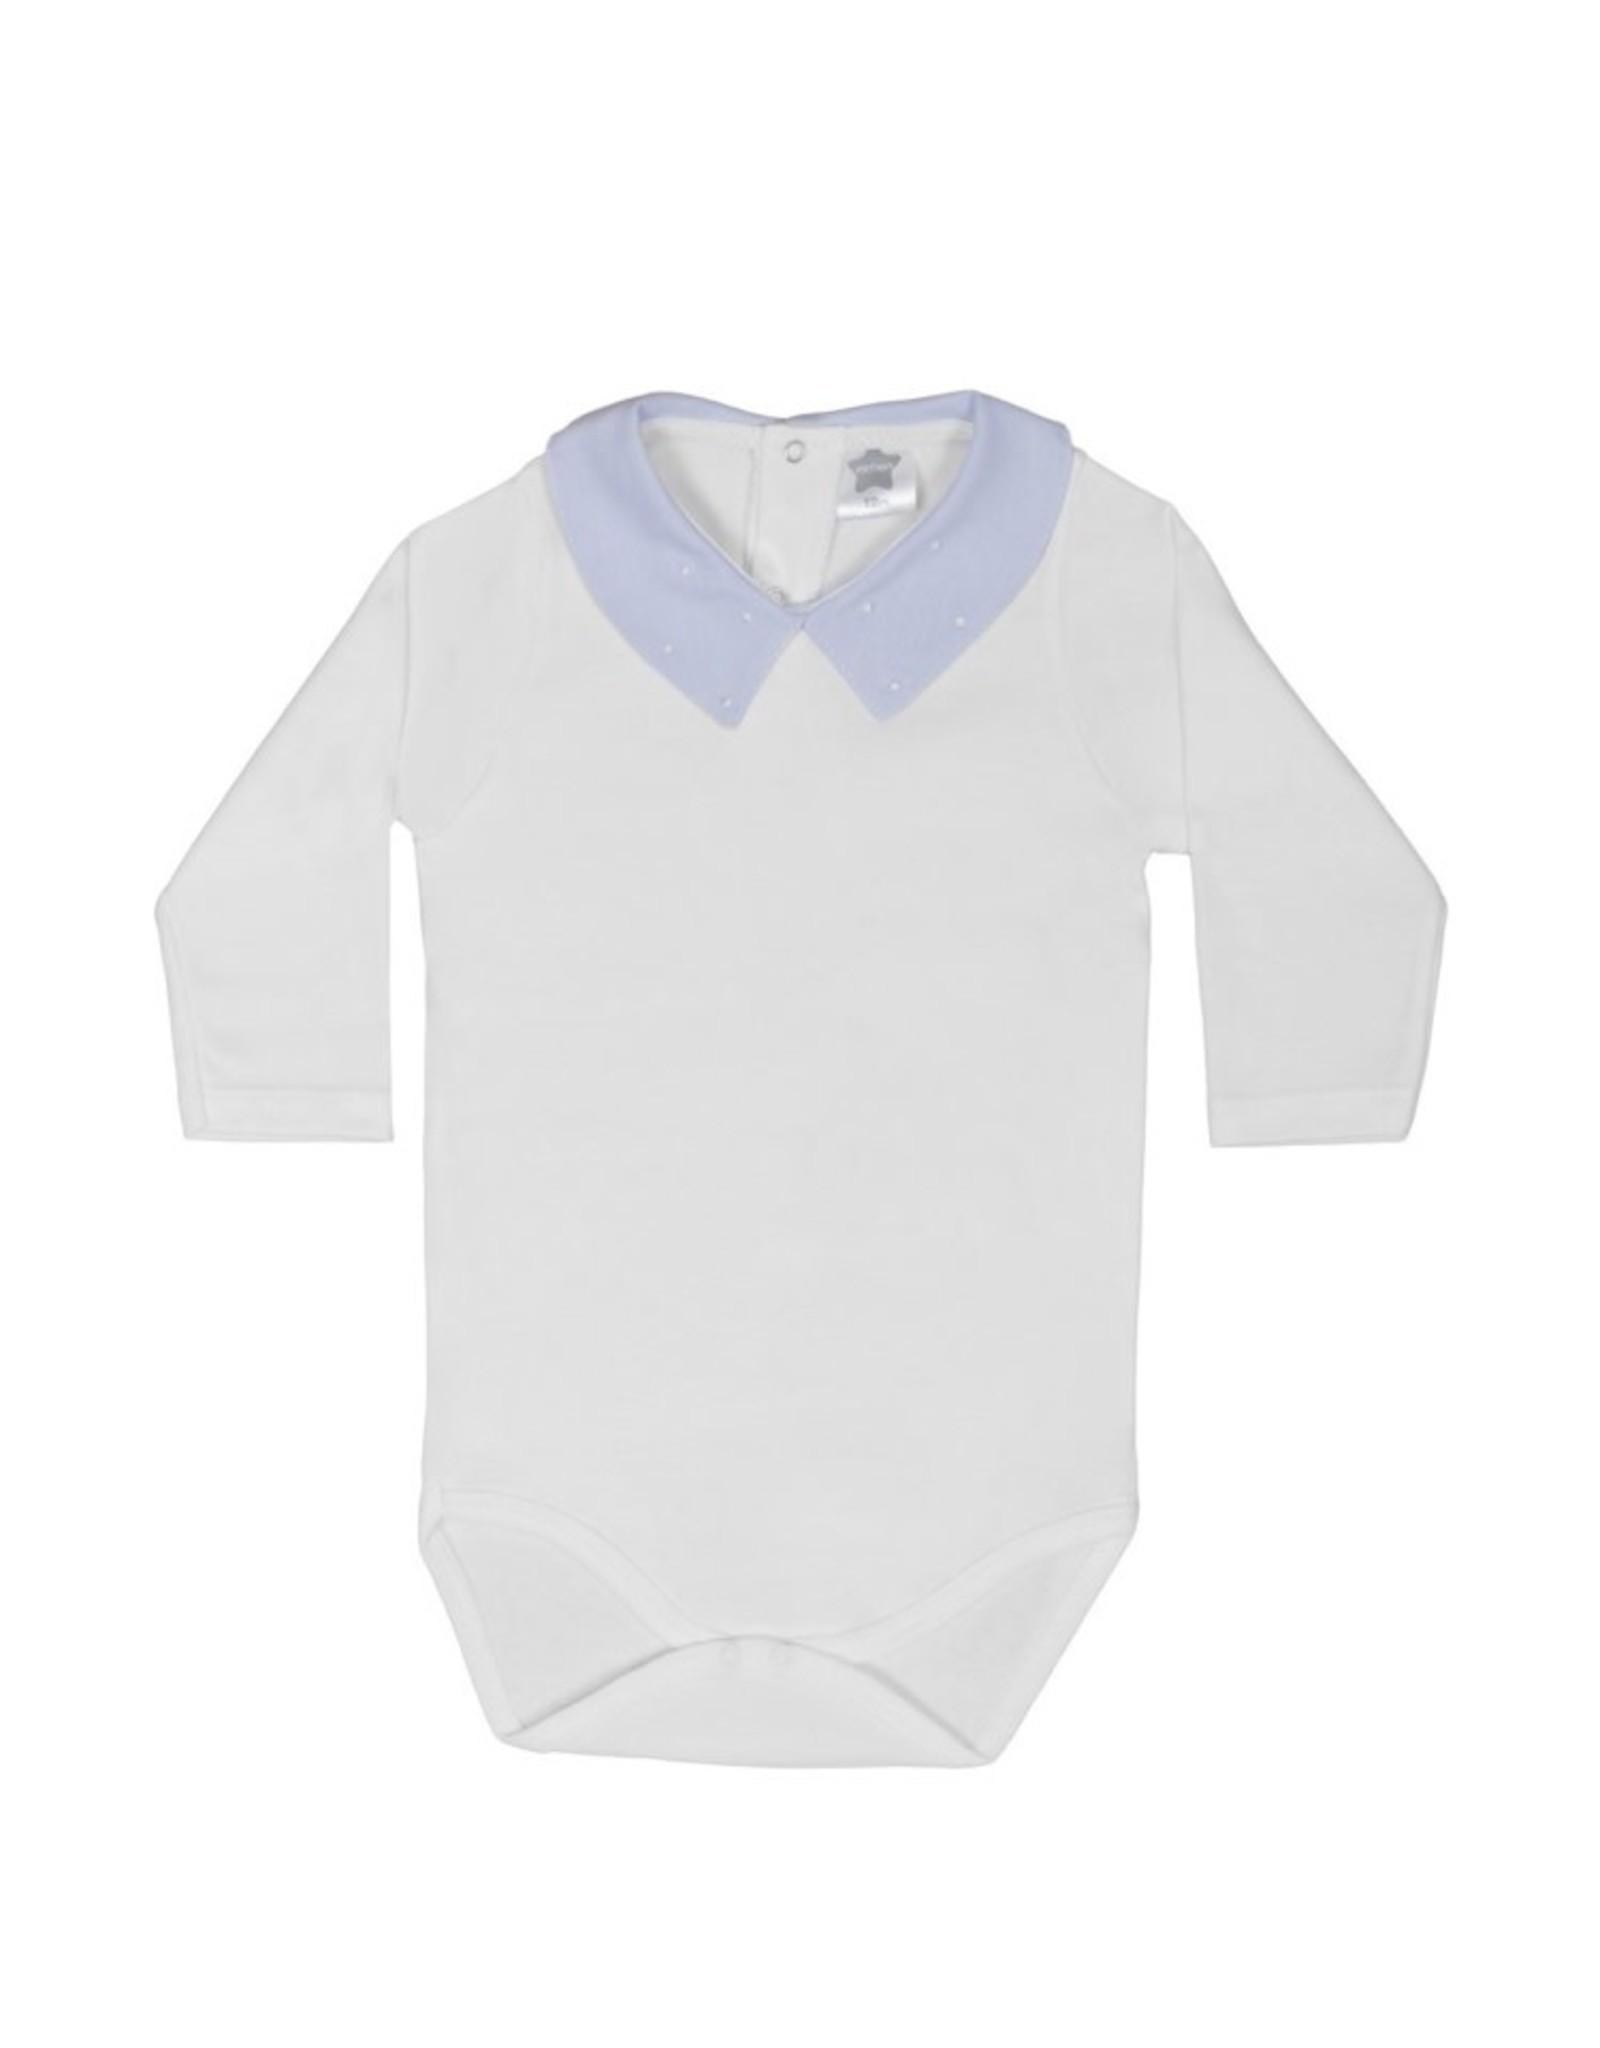 MINHON White Bodyvest with Blue Collar